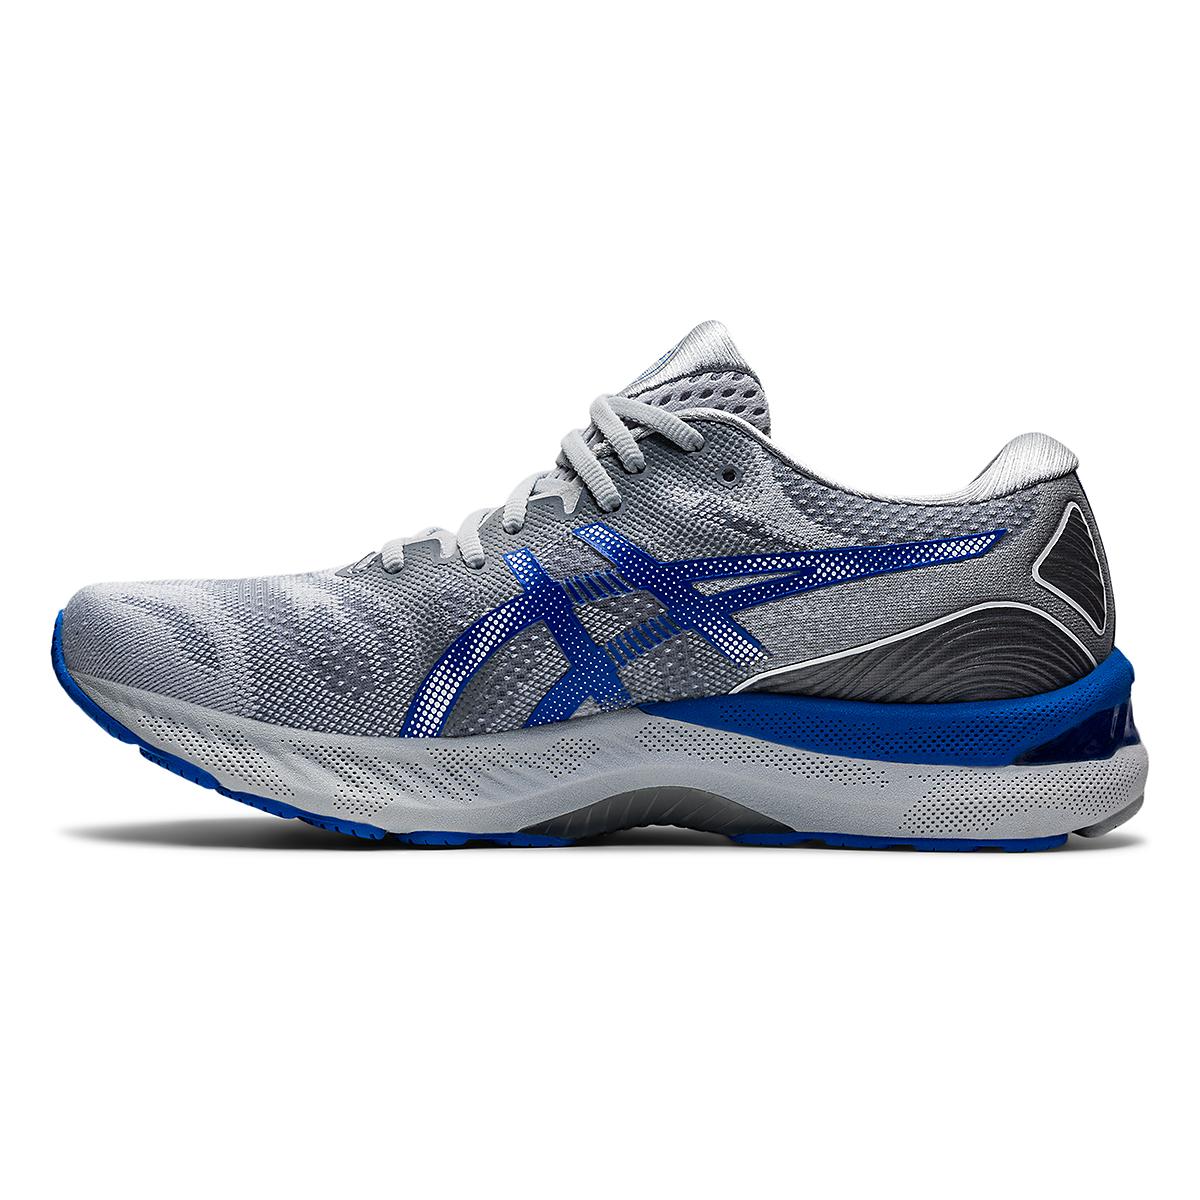 Men's Asics Gel-Nimbus 23 Running Shoe - Color: Piedmont Grey - Size: 6 - Width: Regular, Piedmont Grey, large, image 2